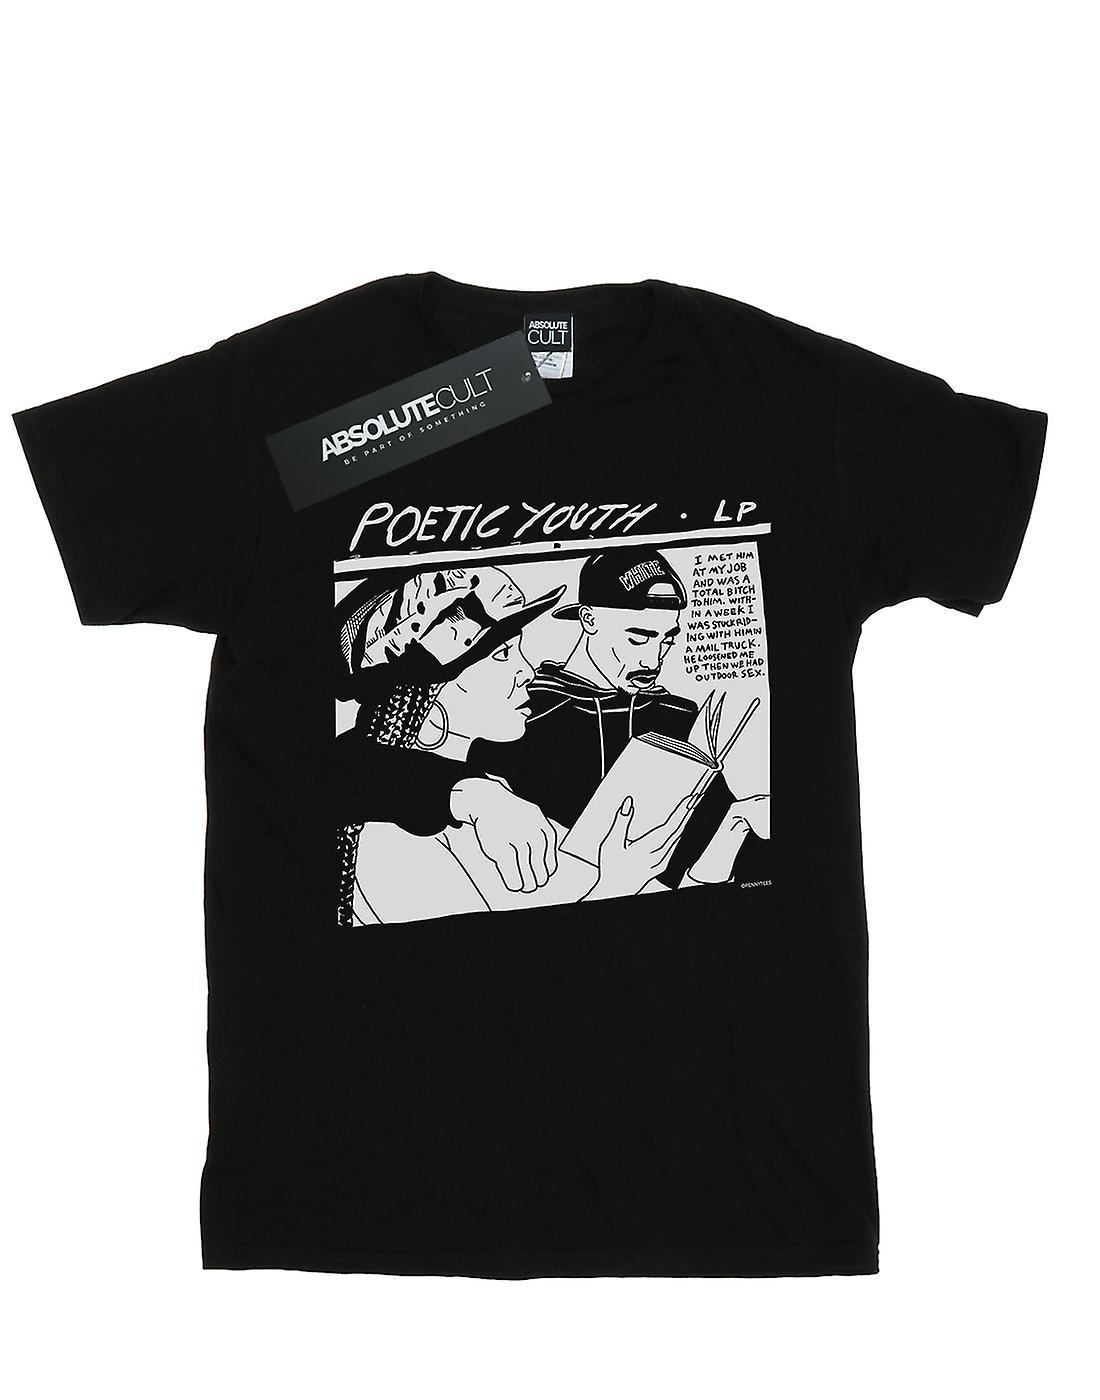 Pennytees Men's Poetic Youth T-Shirt